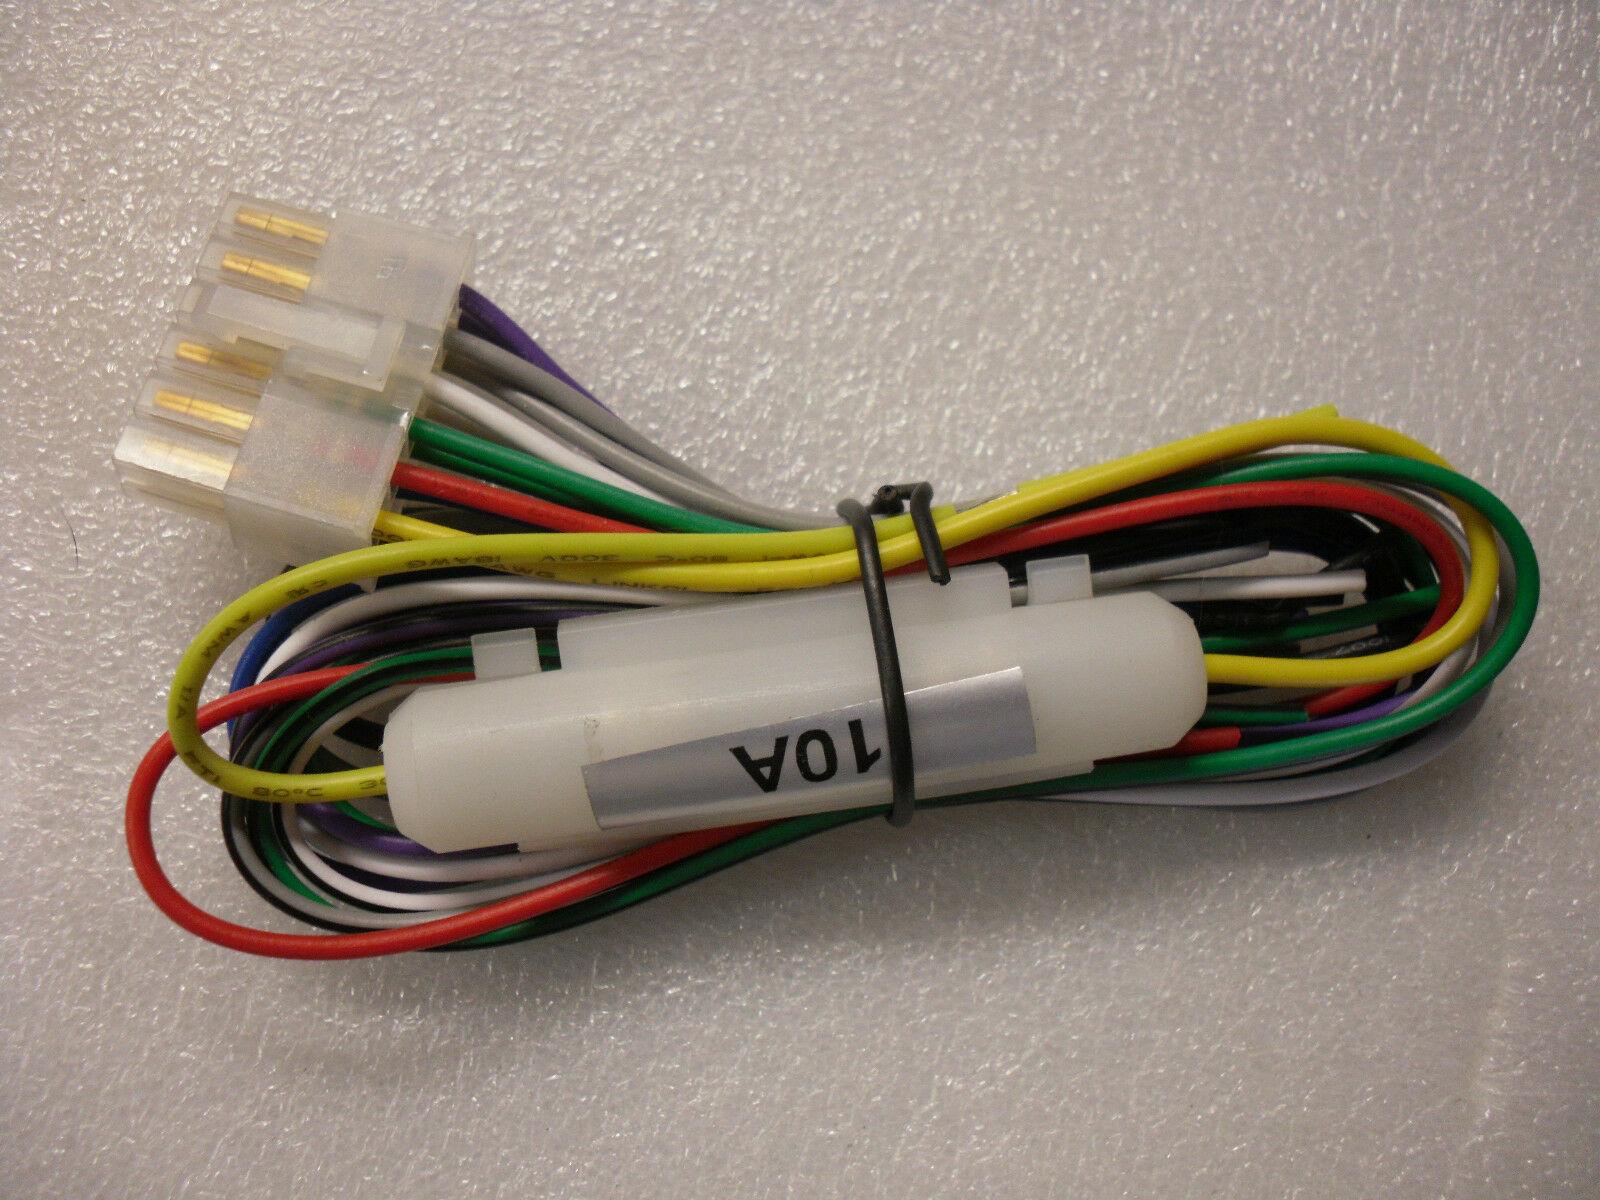 NG_4324] Dual Xdm 260 Wiring HarnessCosm Vira Effl Cajos Vira Mohammedshrine Librar Wiring 101